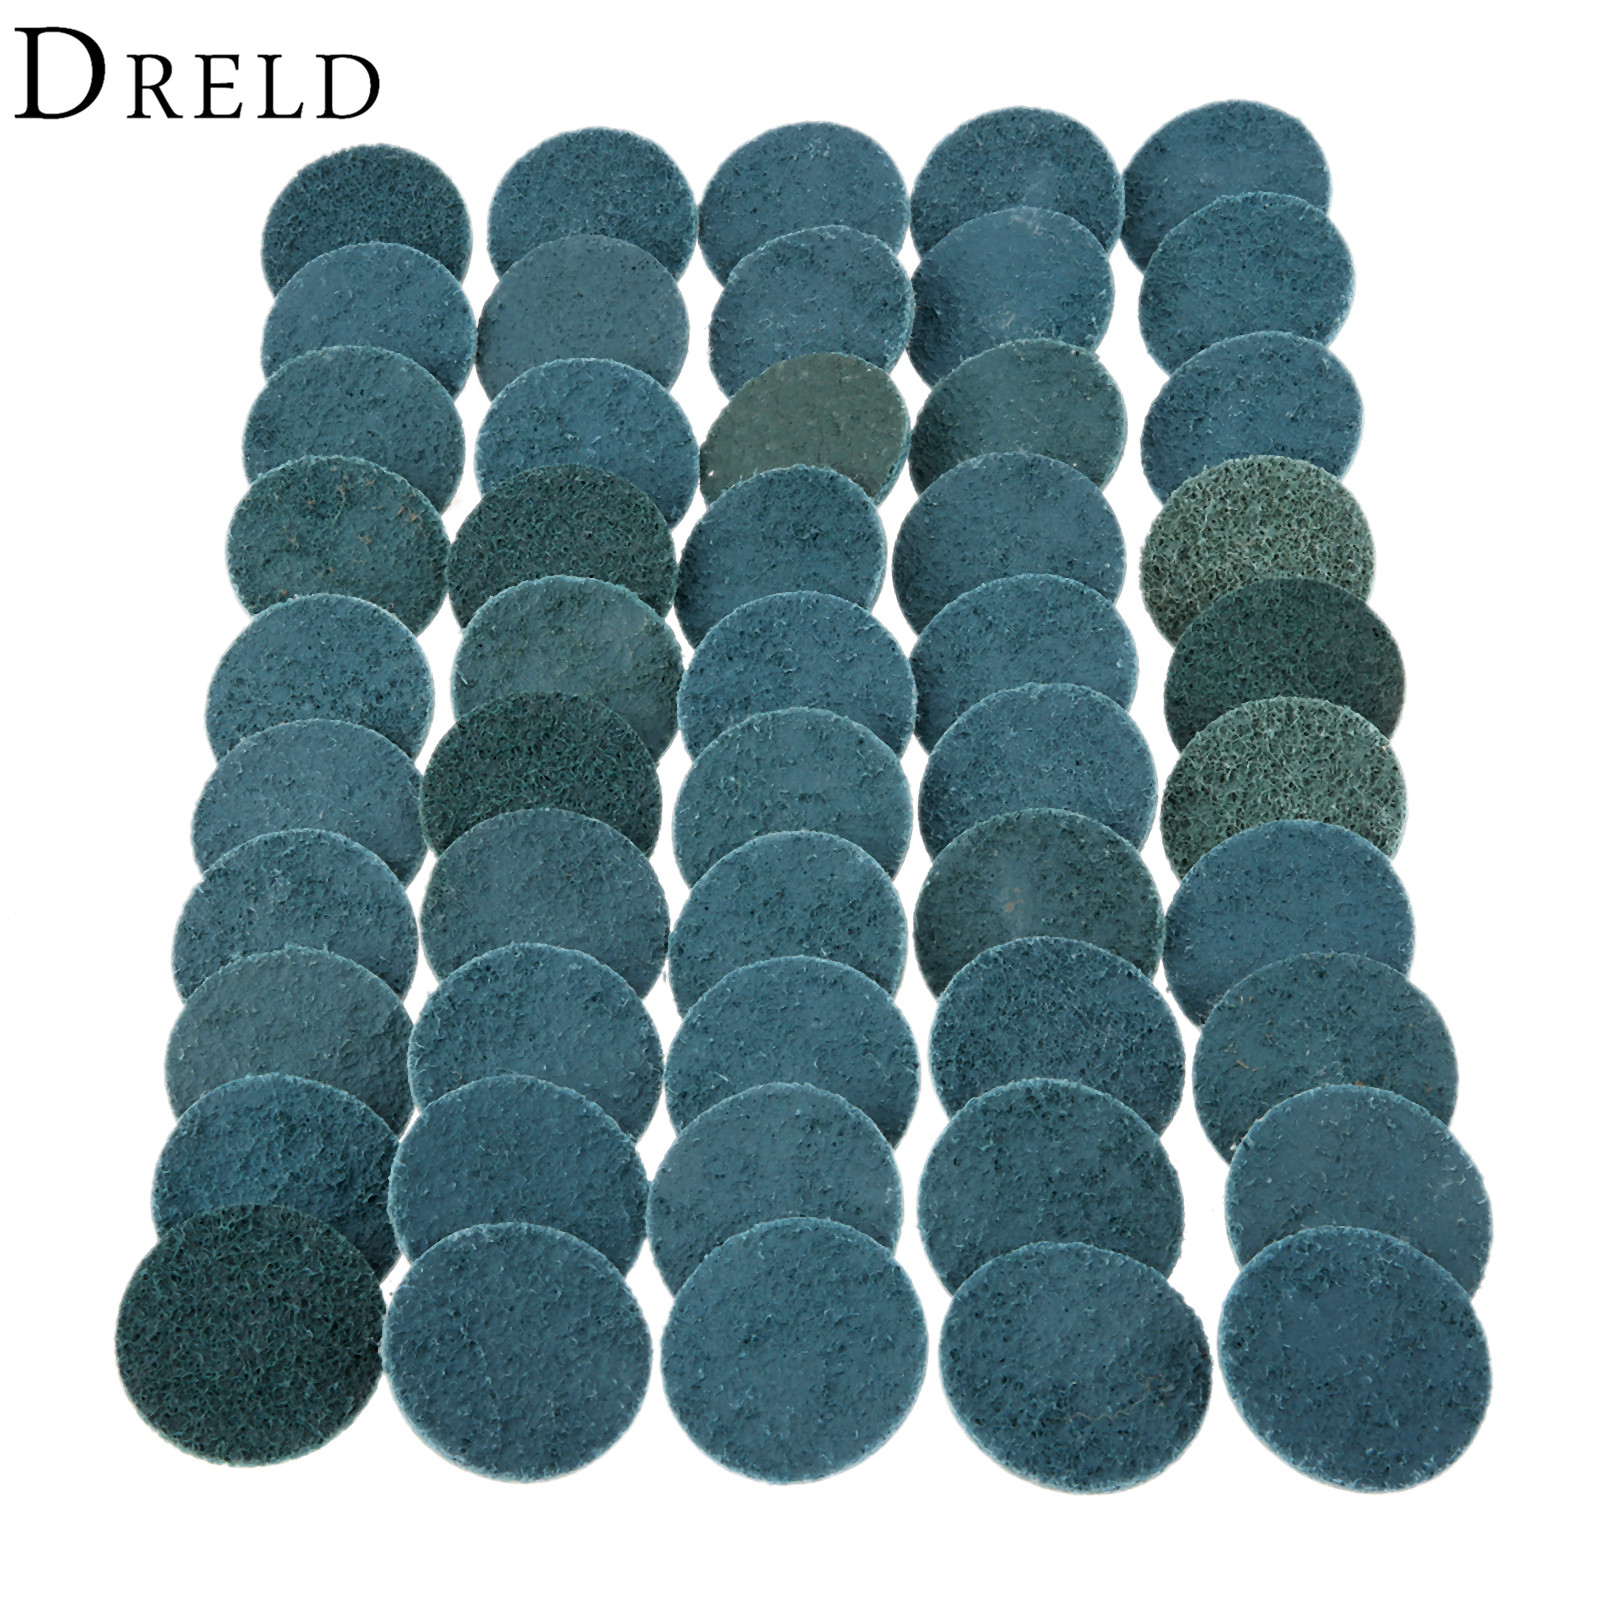 DRELD 50 Pçs/lote 50mm 2